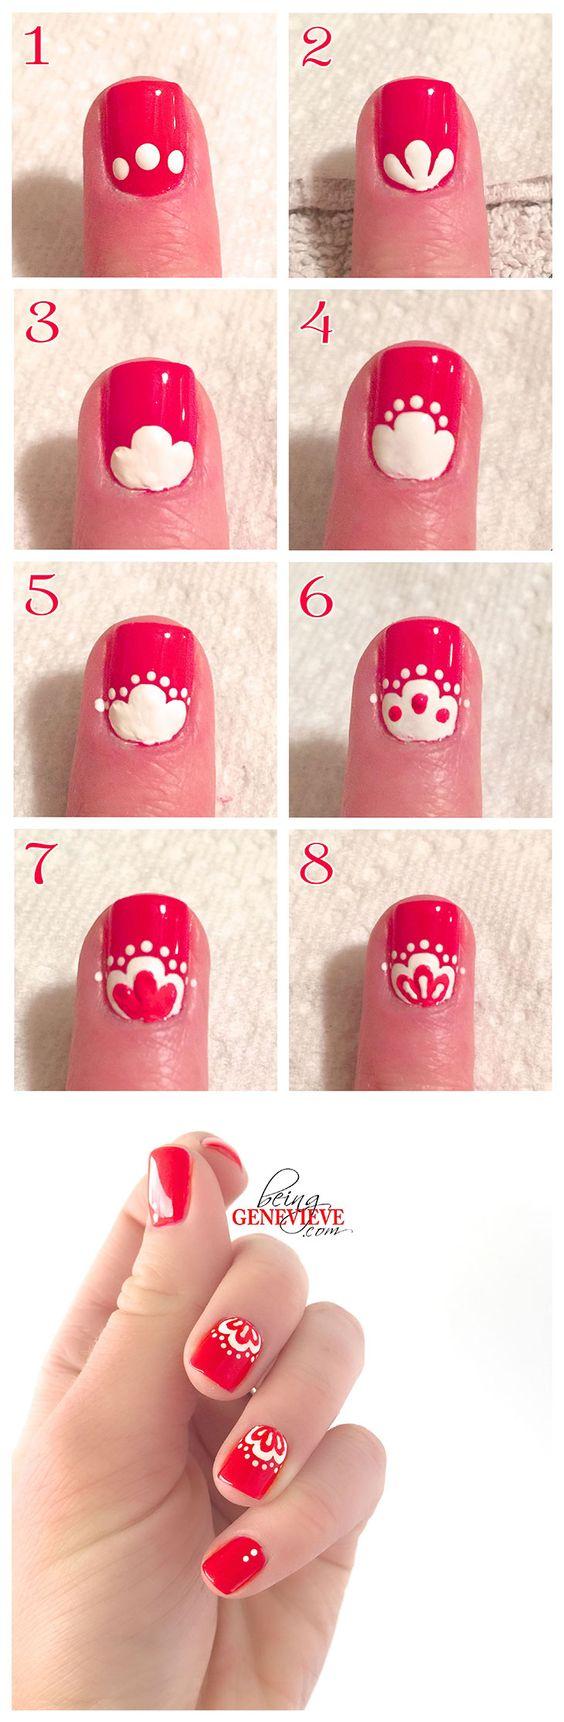 floral-nails via